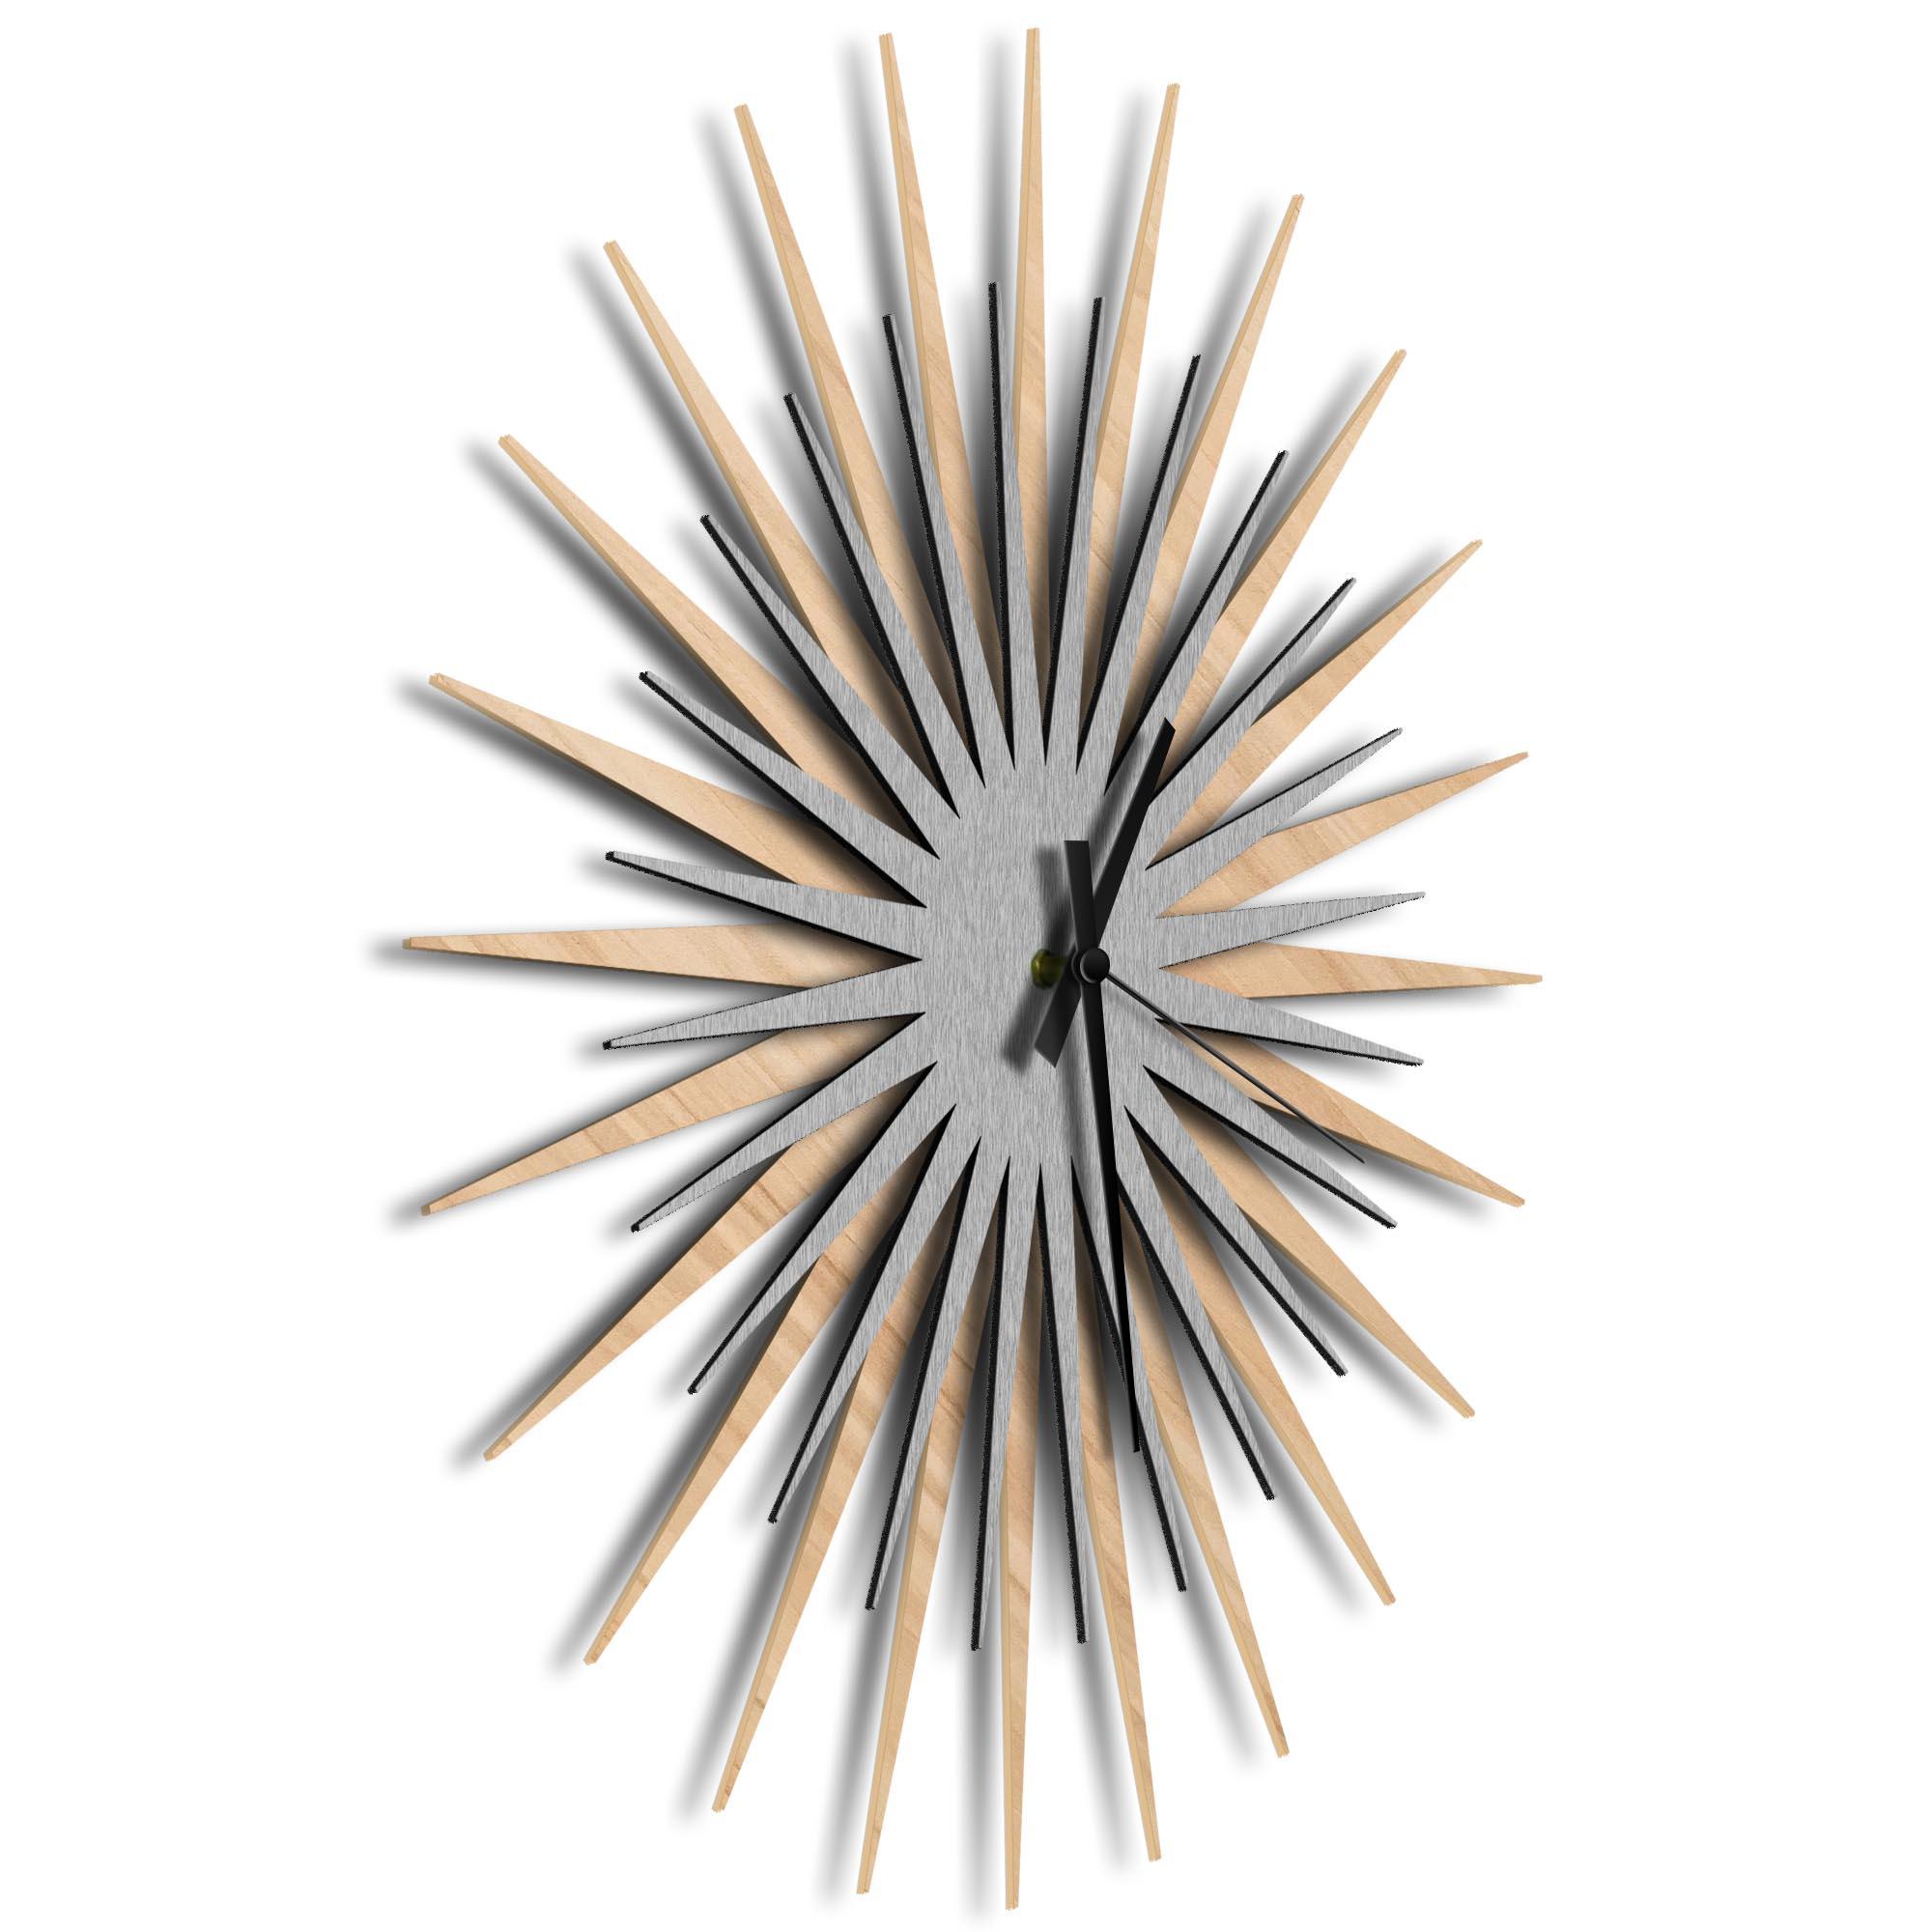 Atomic Era Clock Maple Silver Black by Adam Schwoeppe - Mid-Century Modern Clock on Brushed Maple Polymetal - Image 2